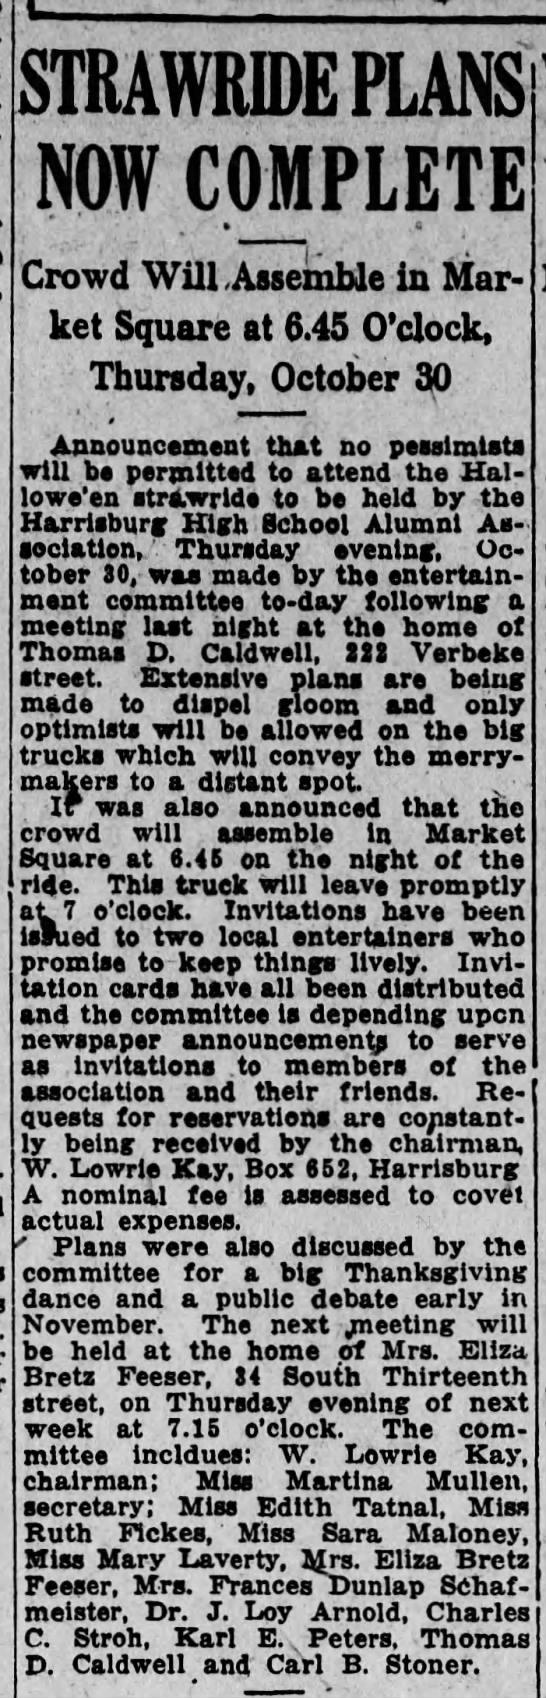 1919 Mrs Eliza Bretz Feeser hosts next Hbg HS Alumni mtg at her home -